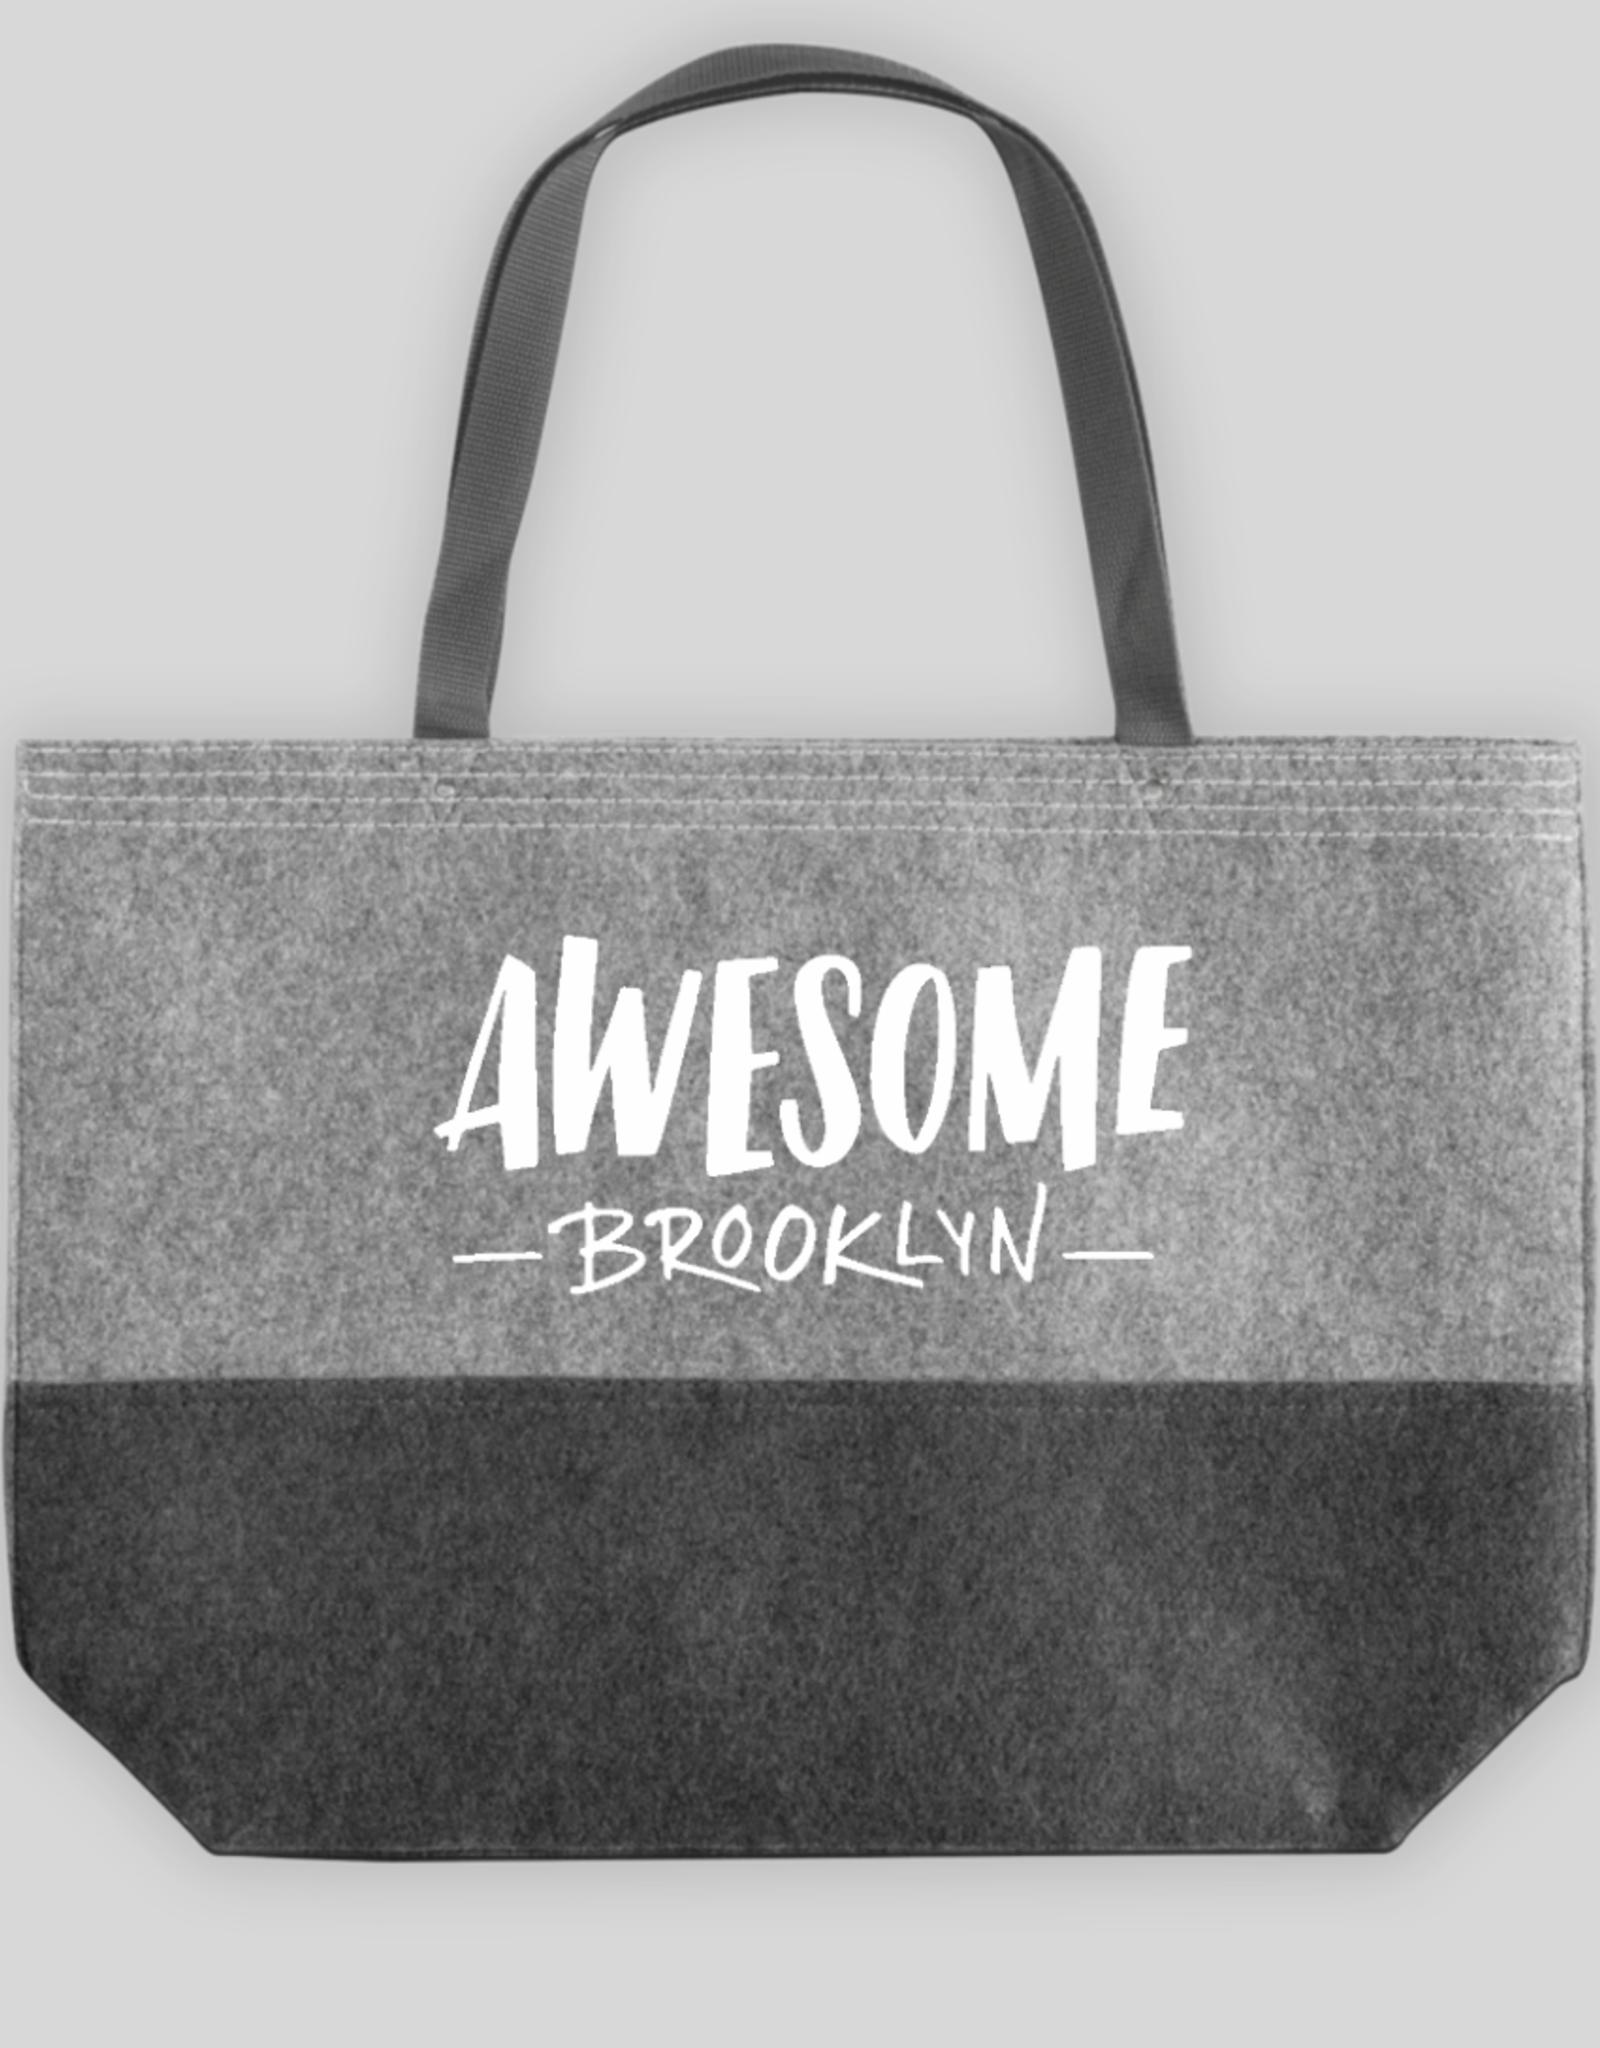 Awesome Brooklyn Felt Tote